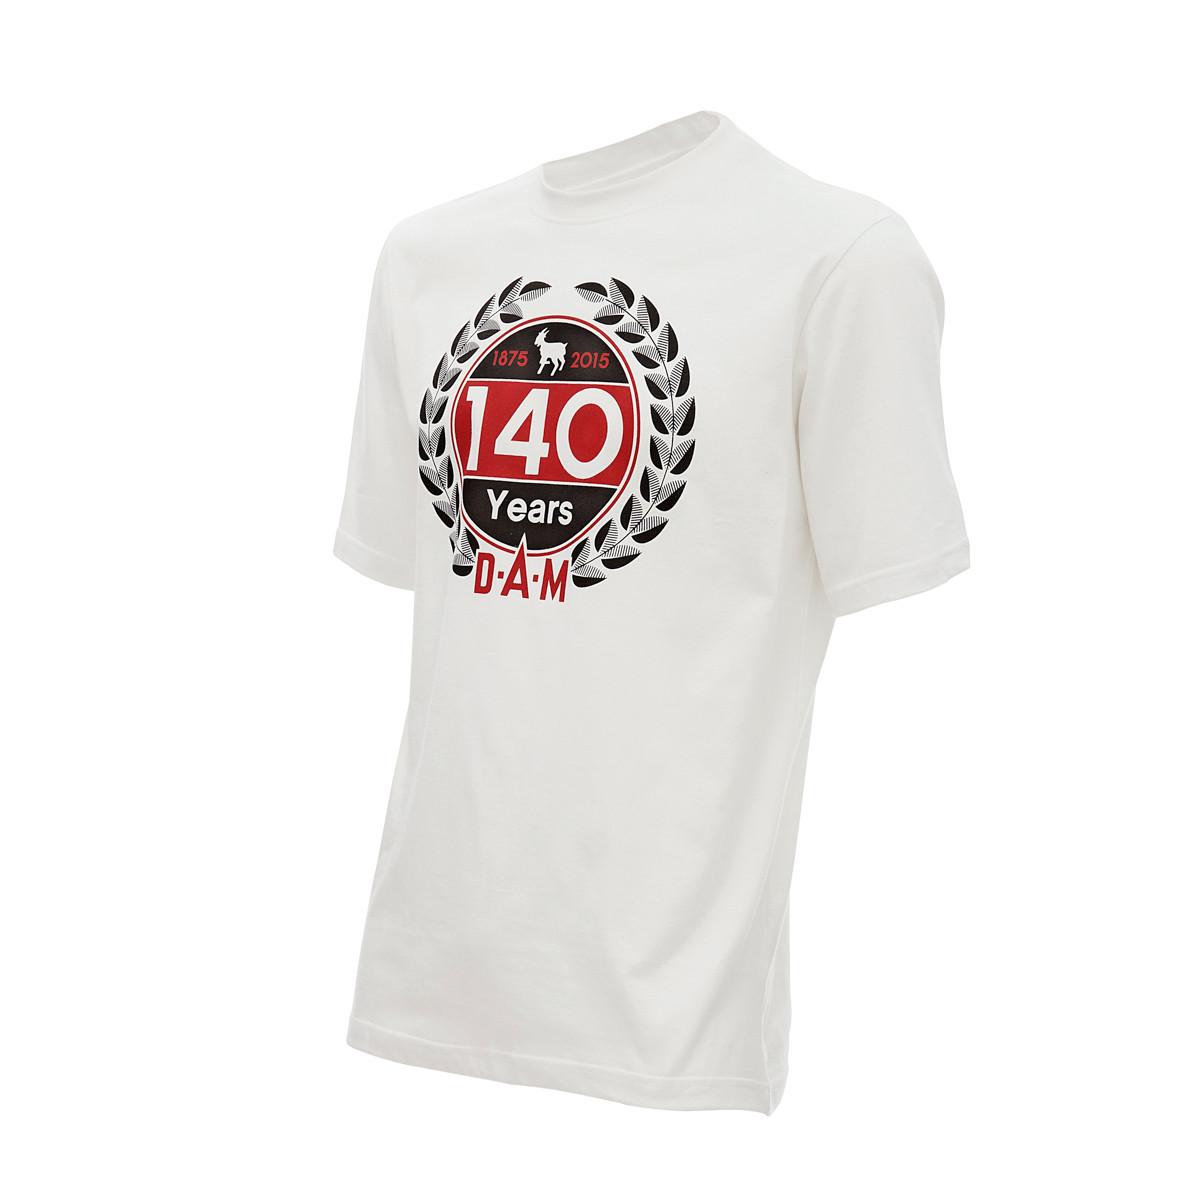 "Футболка DAM  ""140 YEARS"" XL"